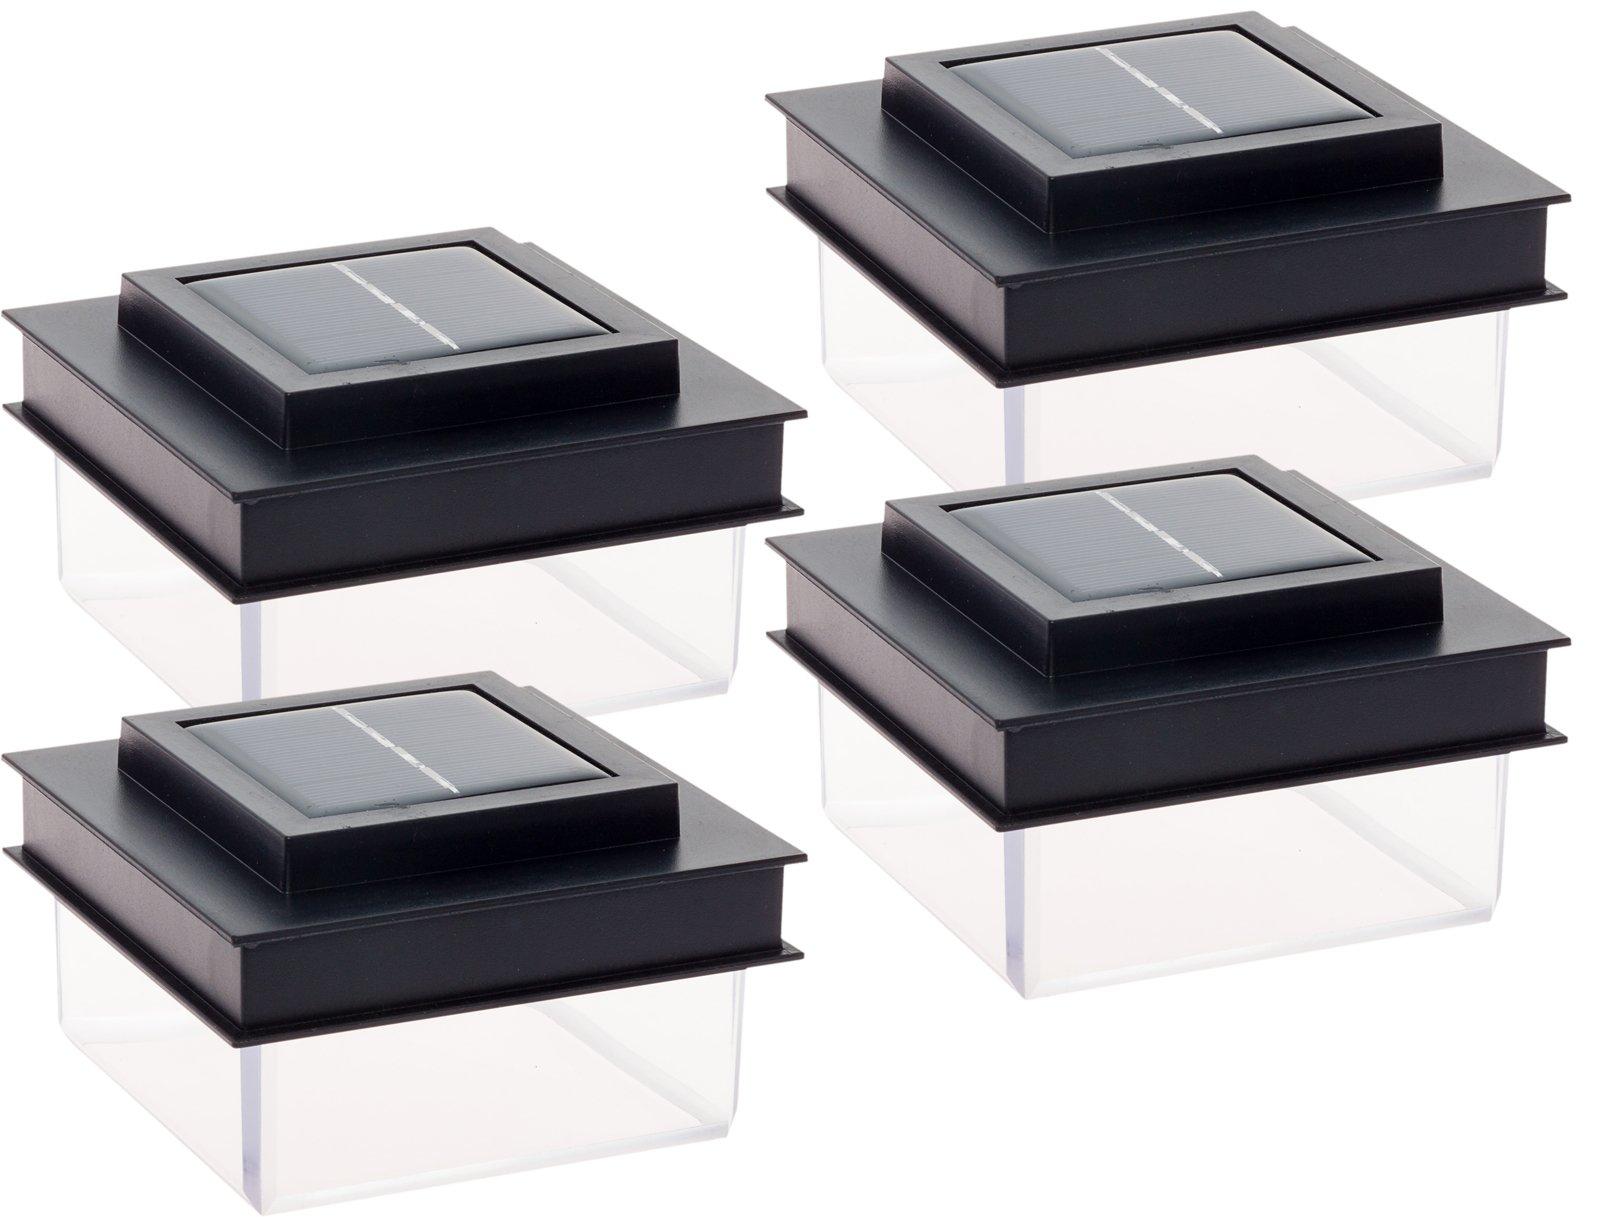 GreenLighting Translucent 12 Lumen LED Solar Powered Post Cap Light for 4x4 Wood Posts (4 Pack, Black)